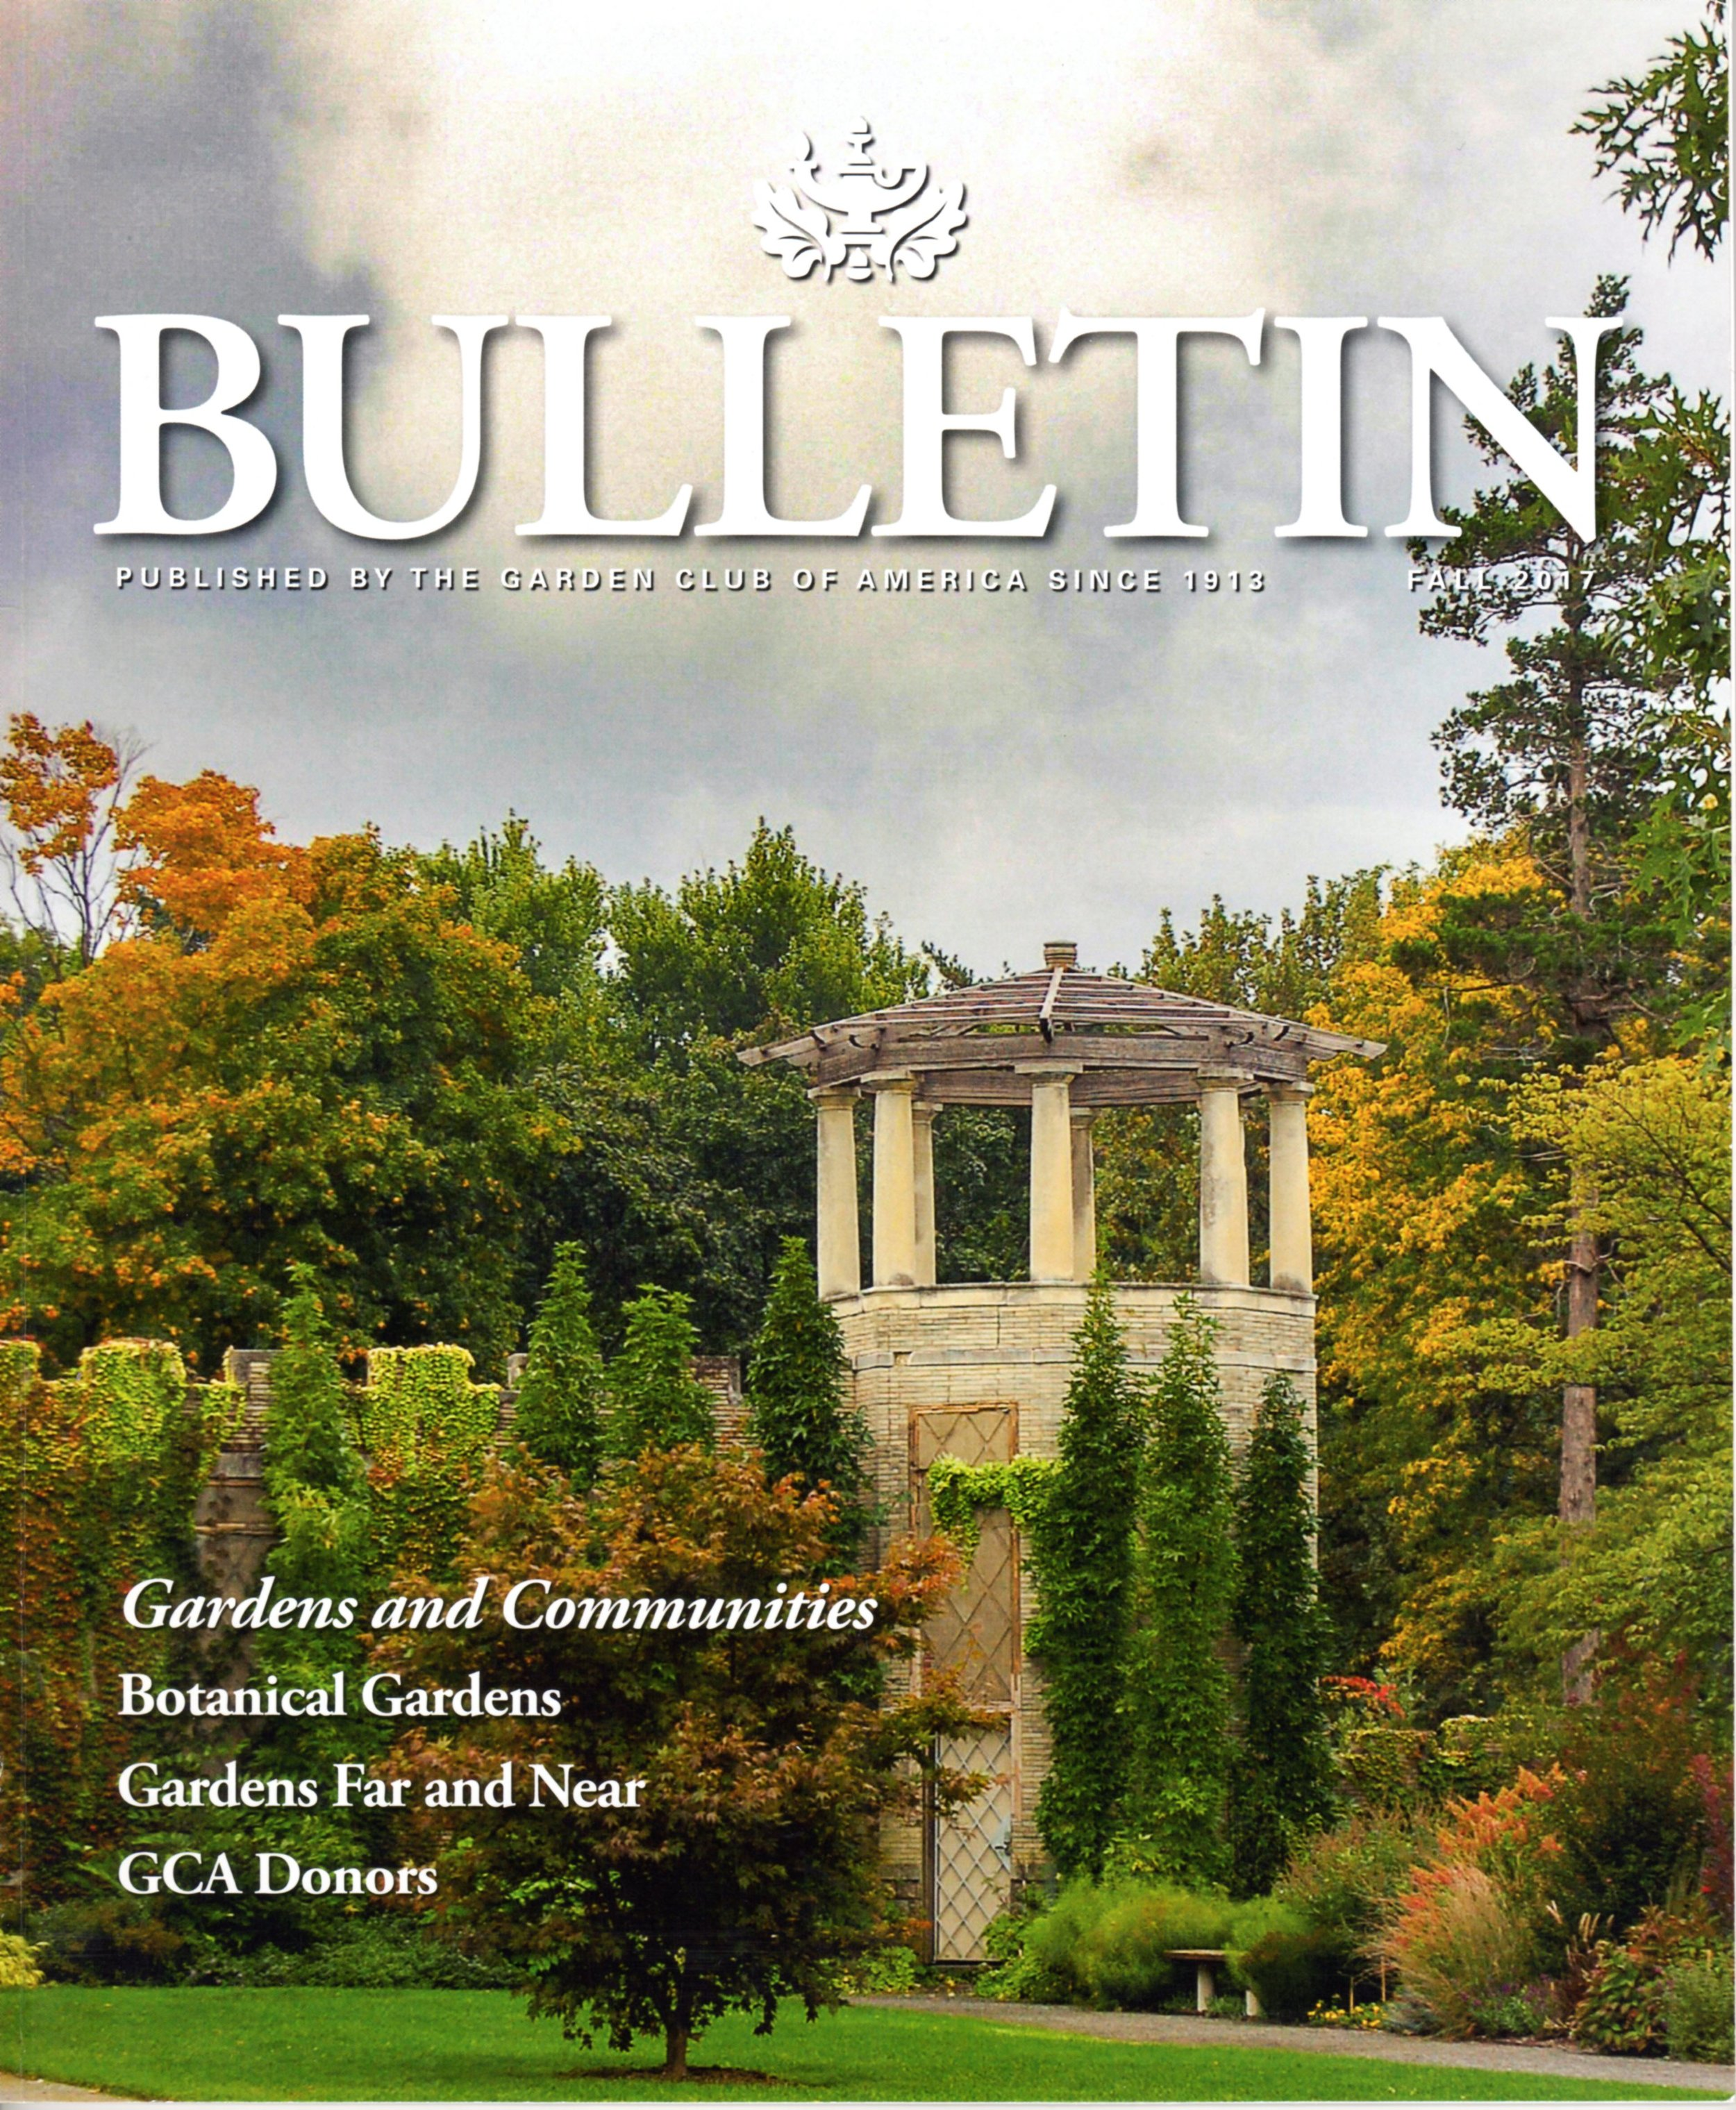 Pennoyer Newman in Garden Club of America Bulletin, Fall 2017